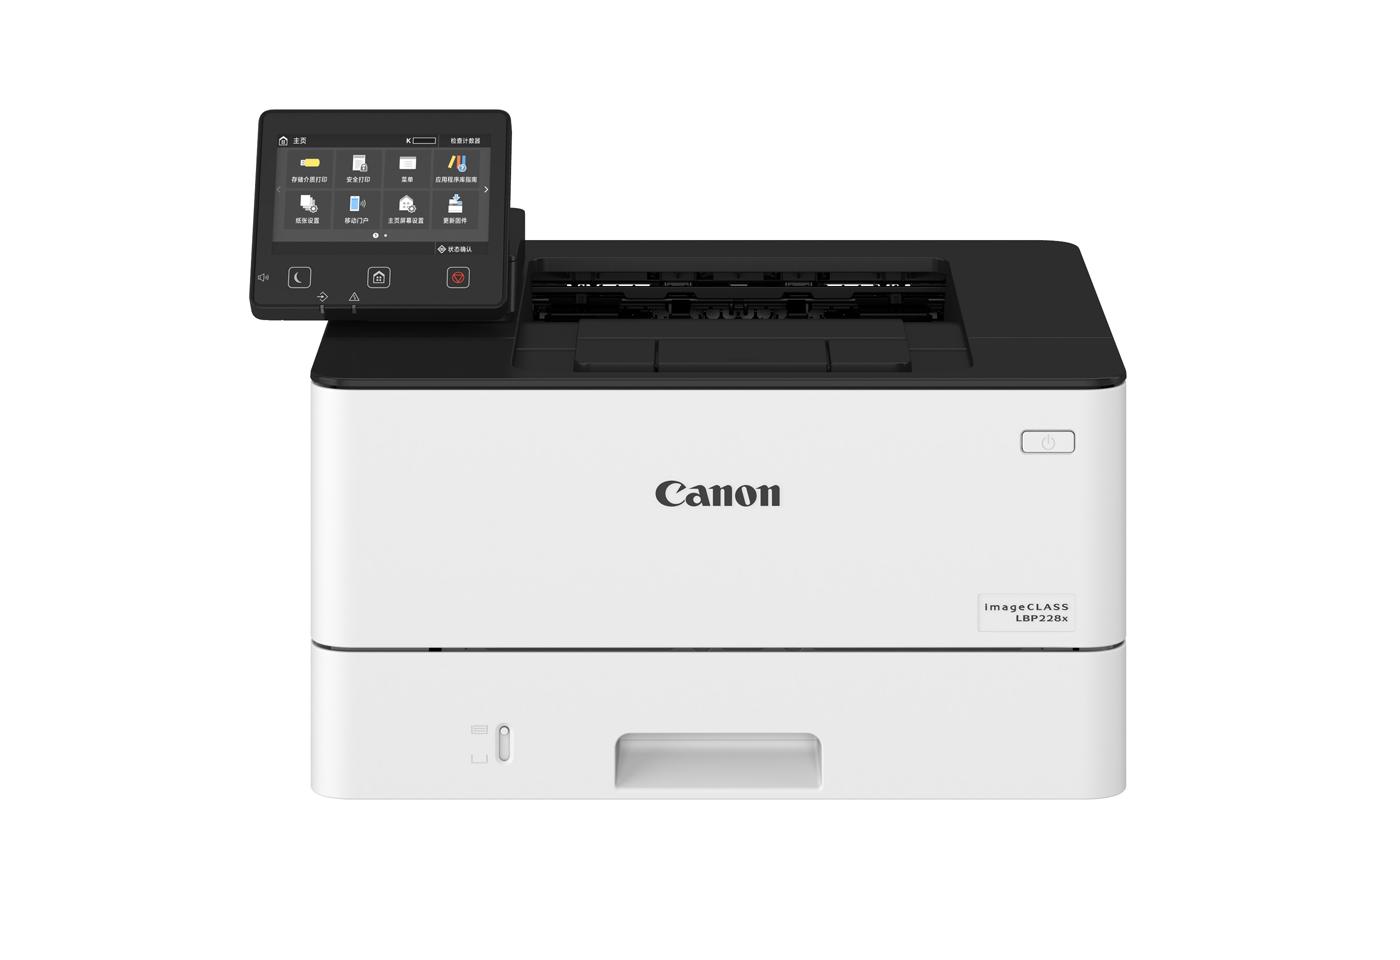 Canon imageCLASS LBP228x